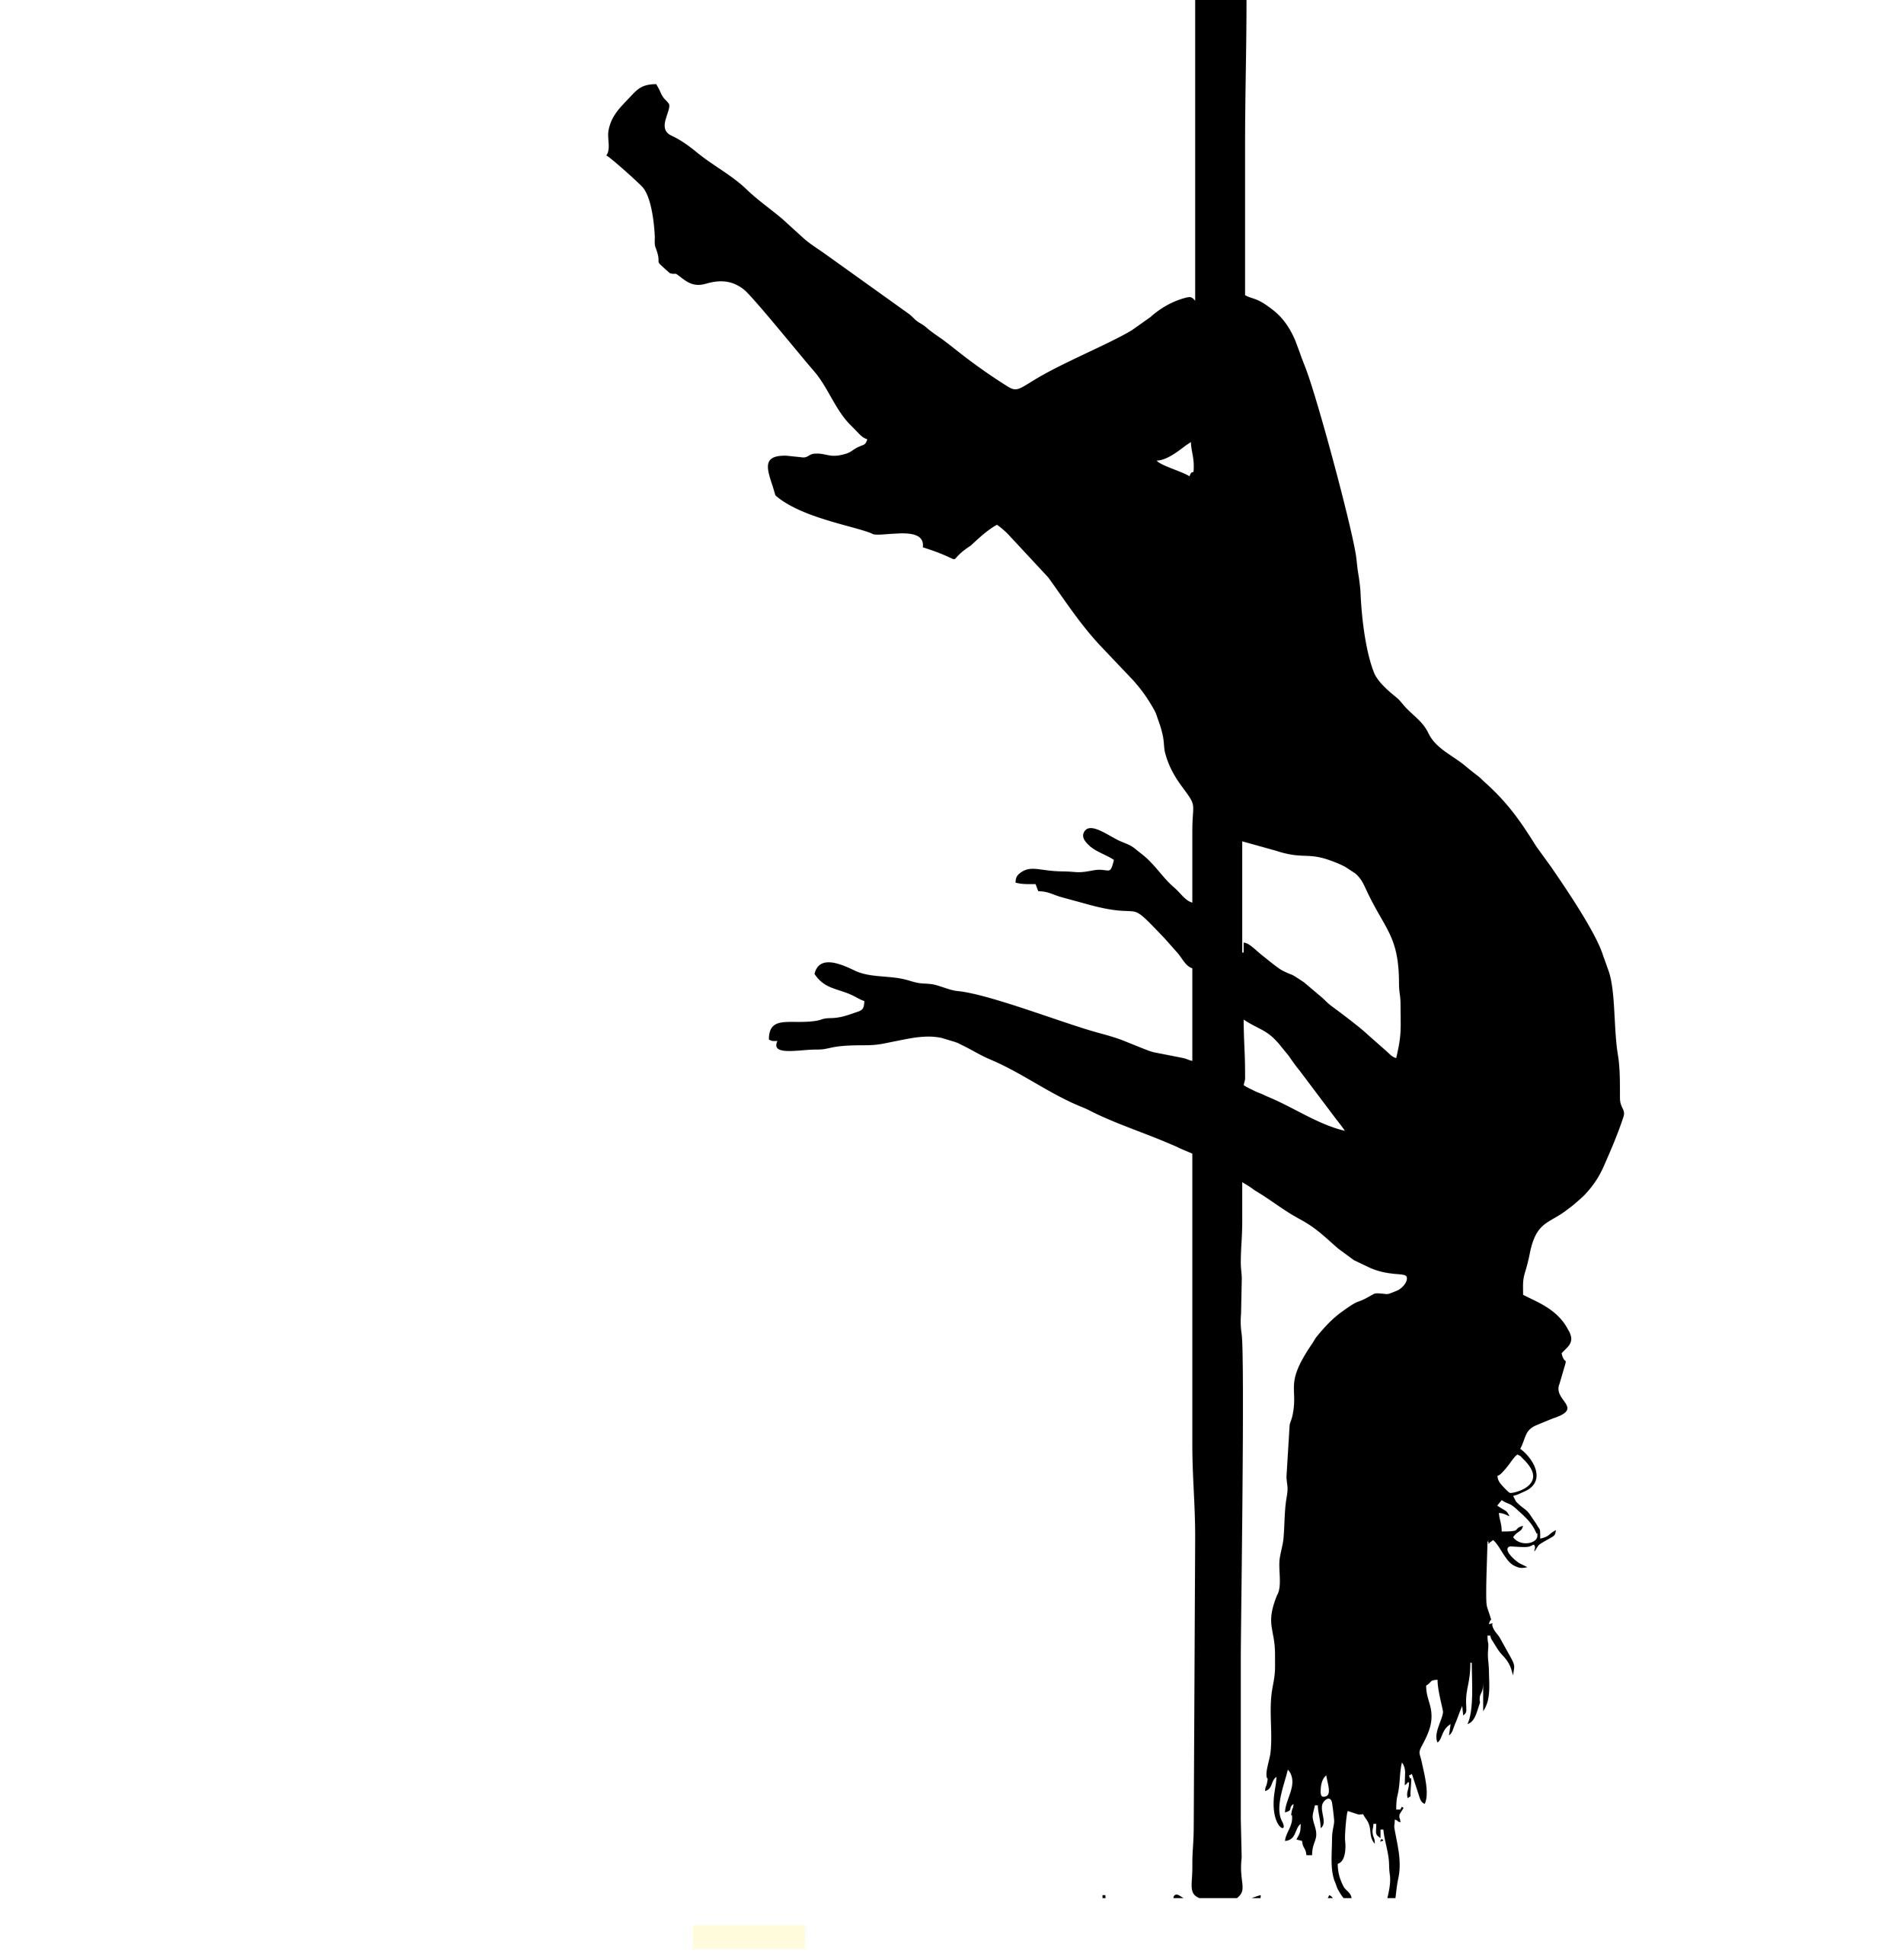 Clipart pole dancing.